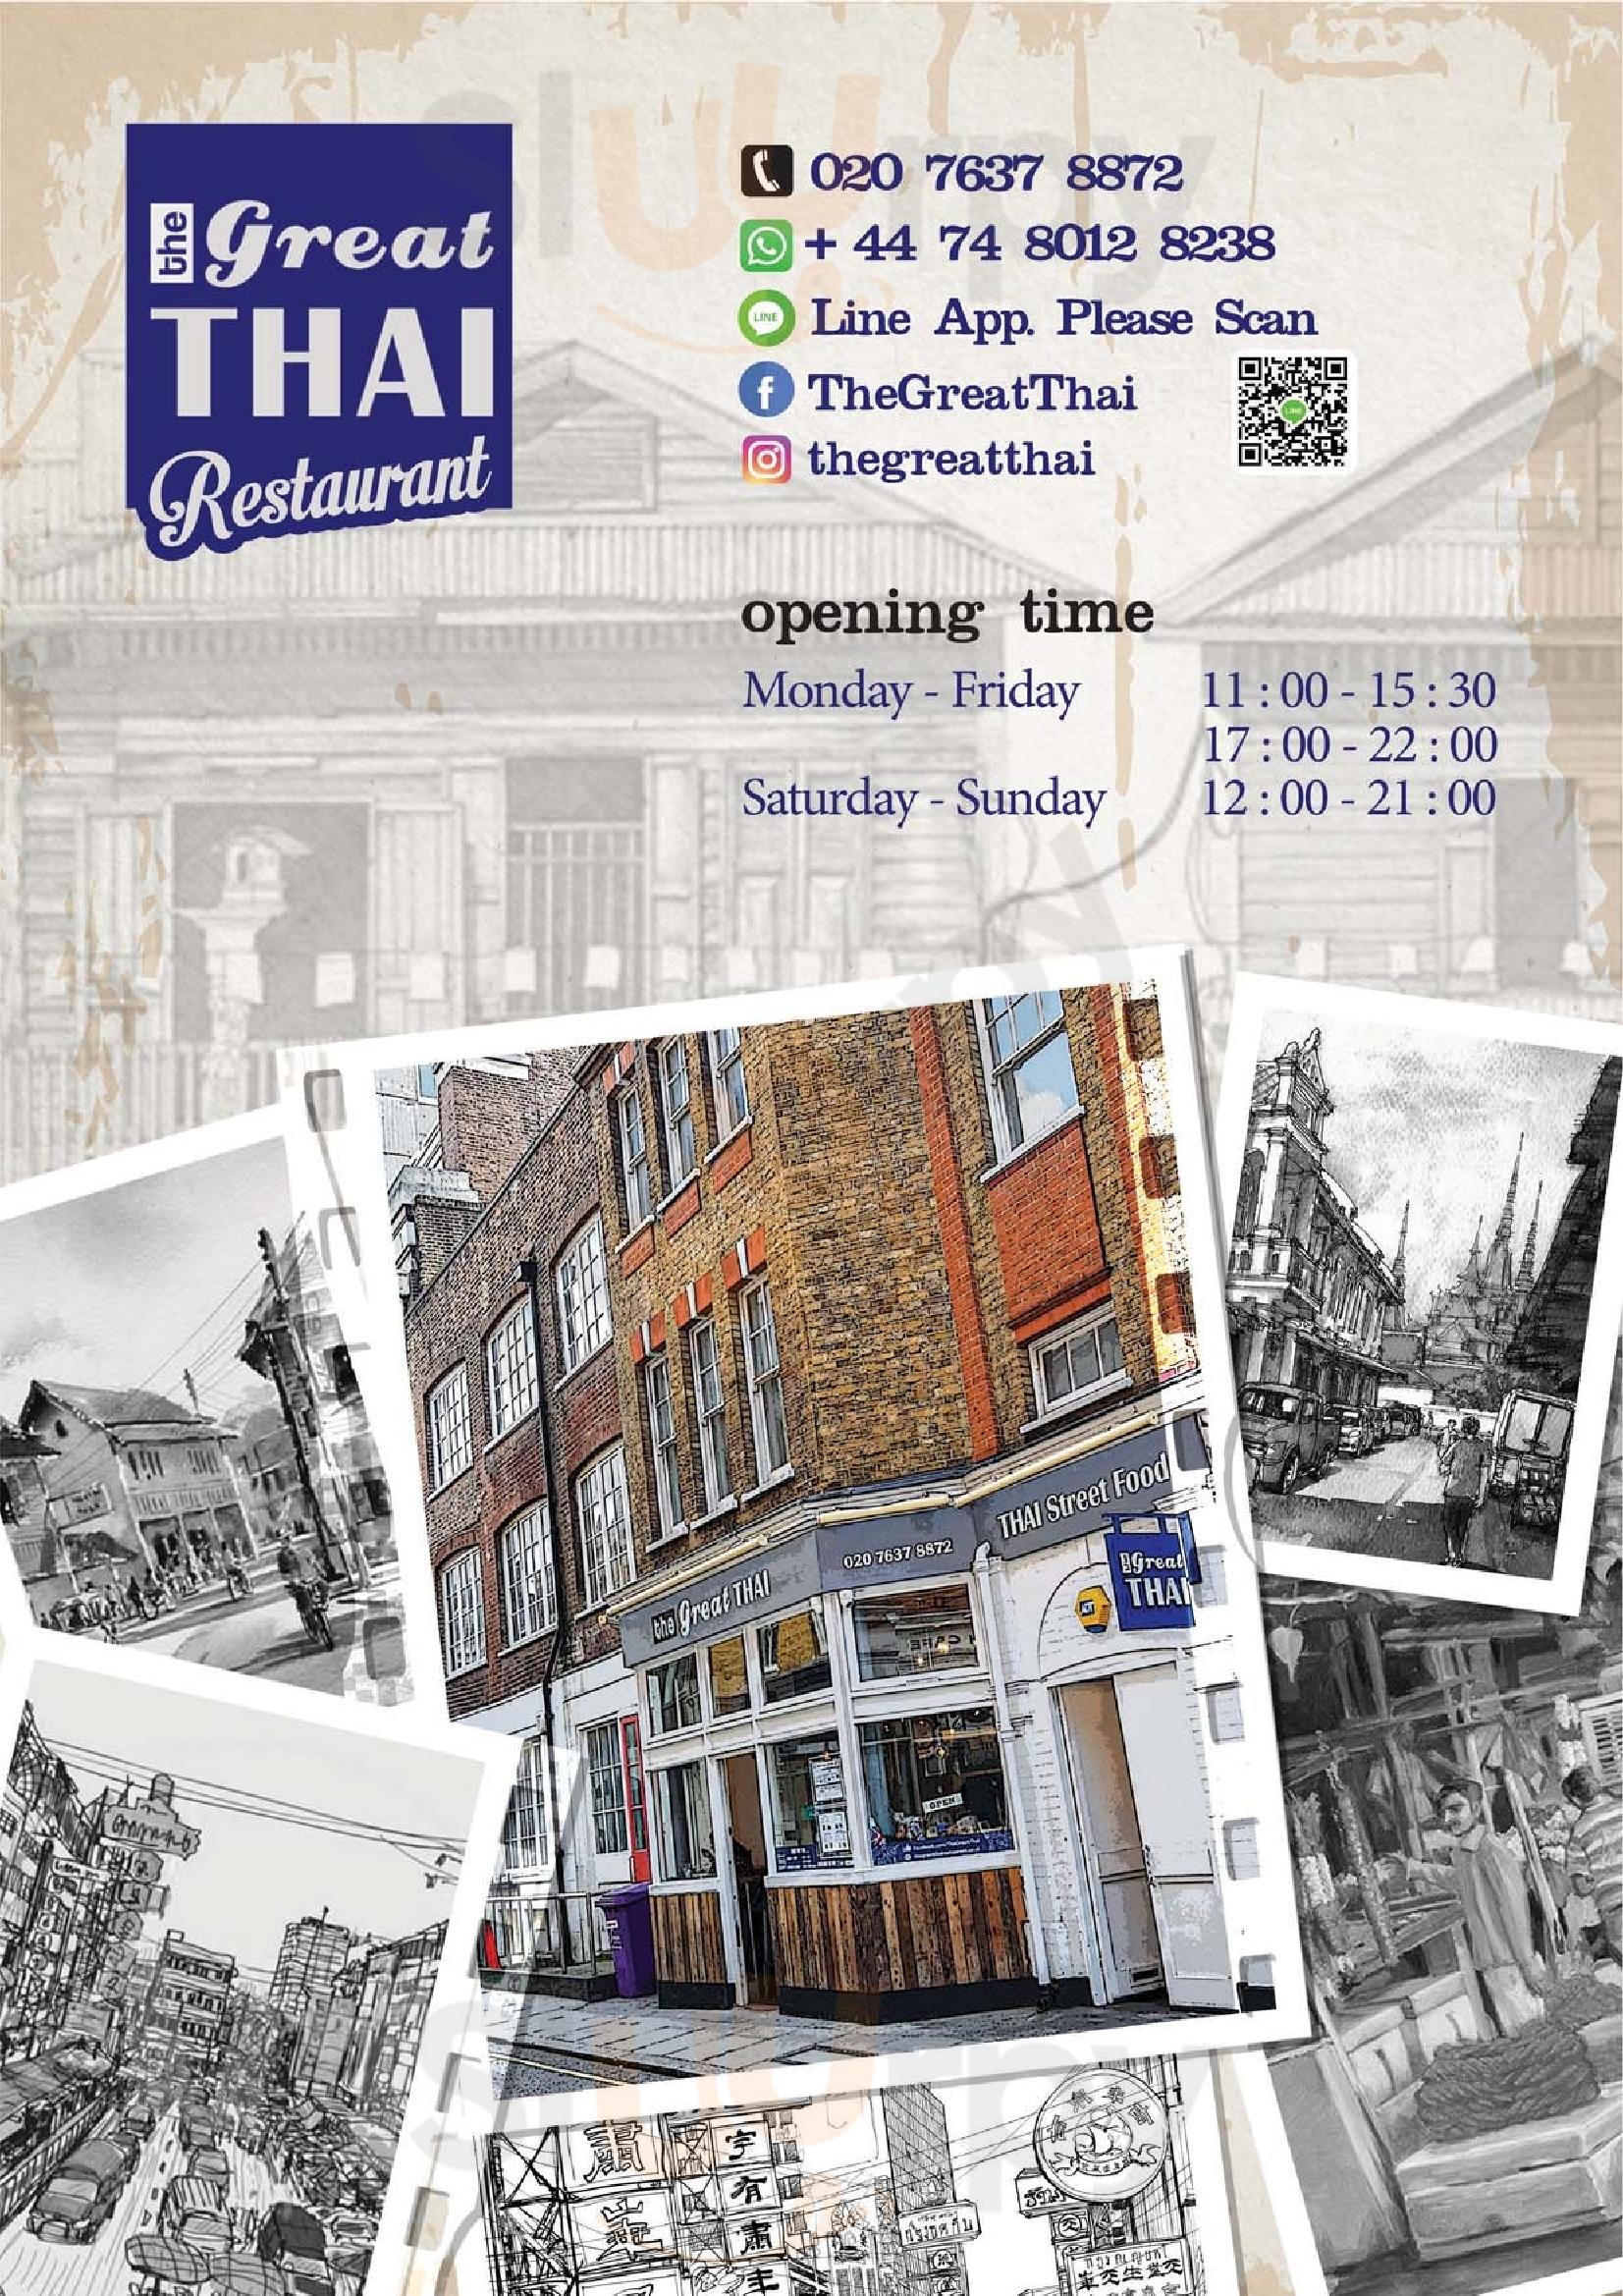 The Great Thai Restaurant London Menu - 1